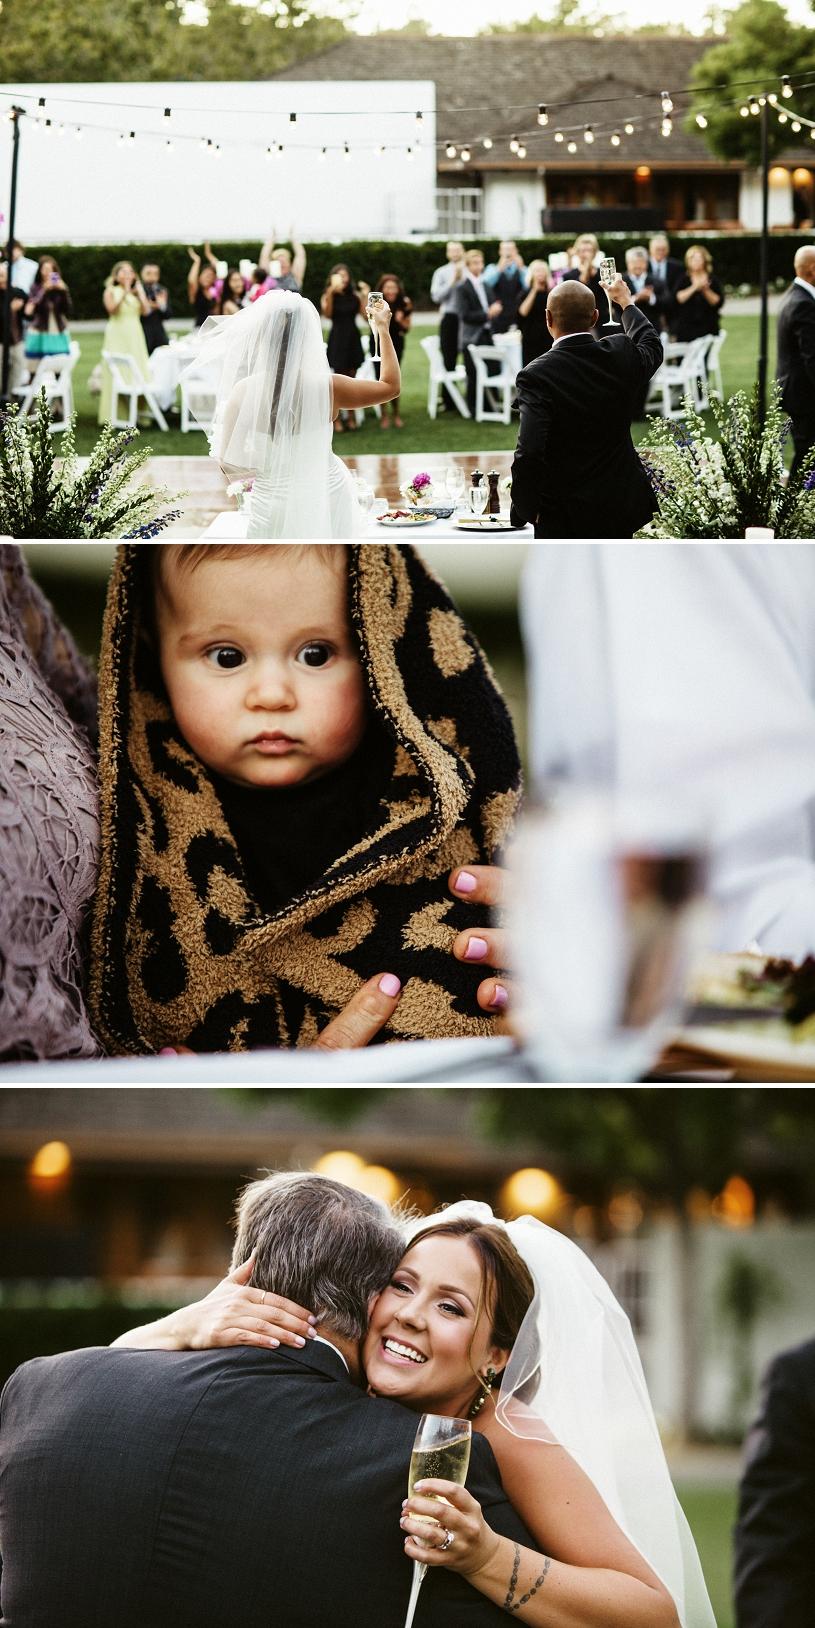 outdoor wedding reception at wente vineyards in livermore